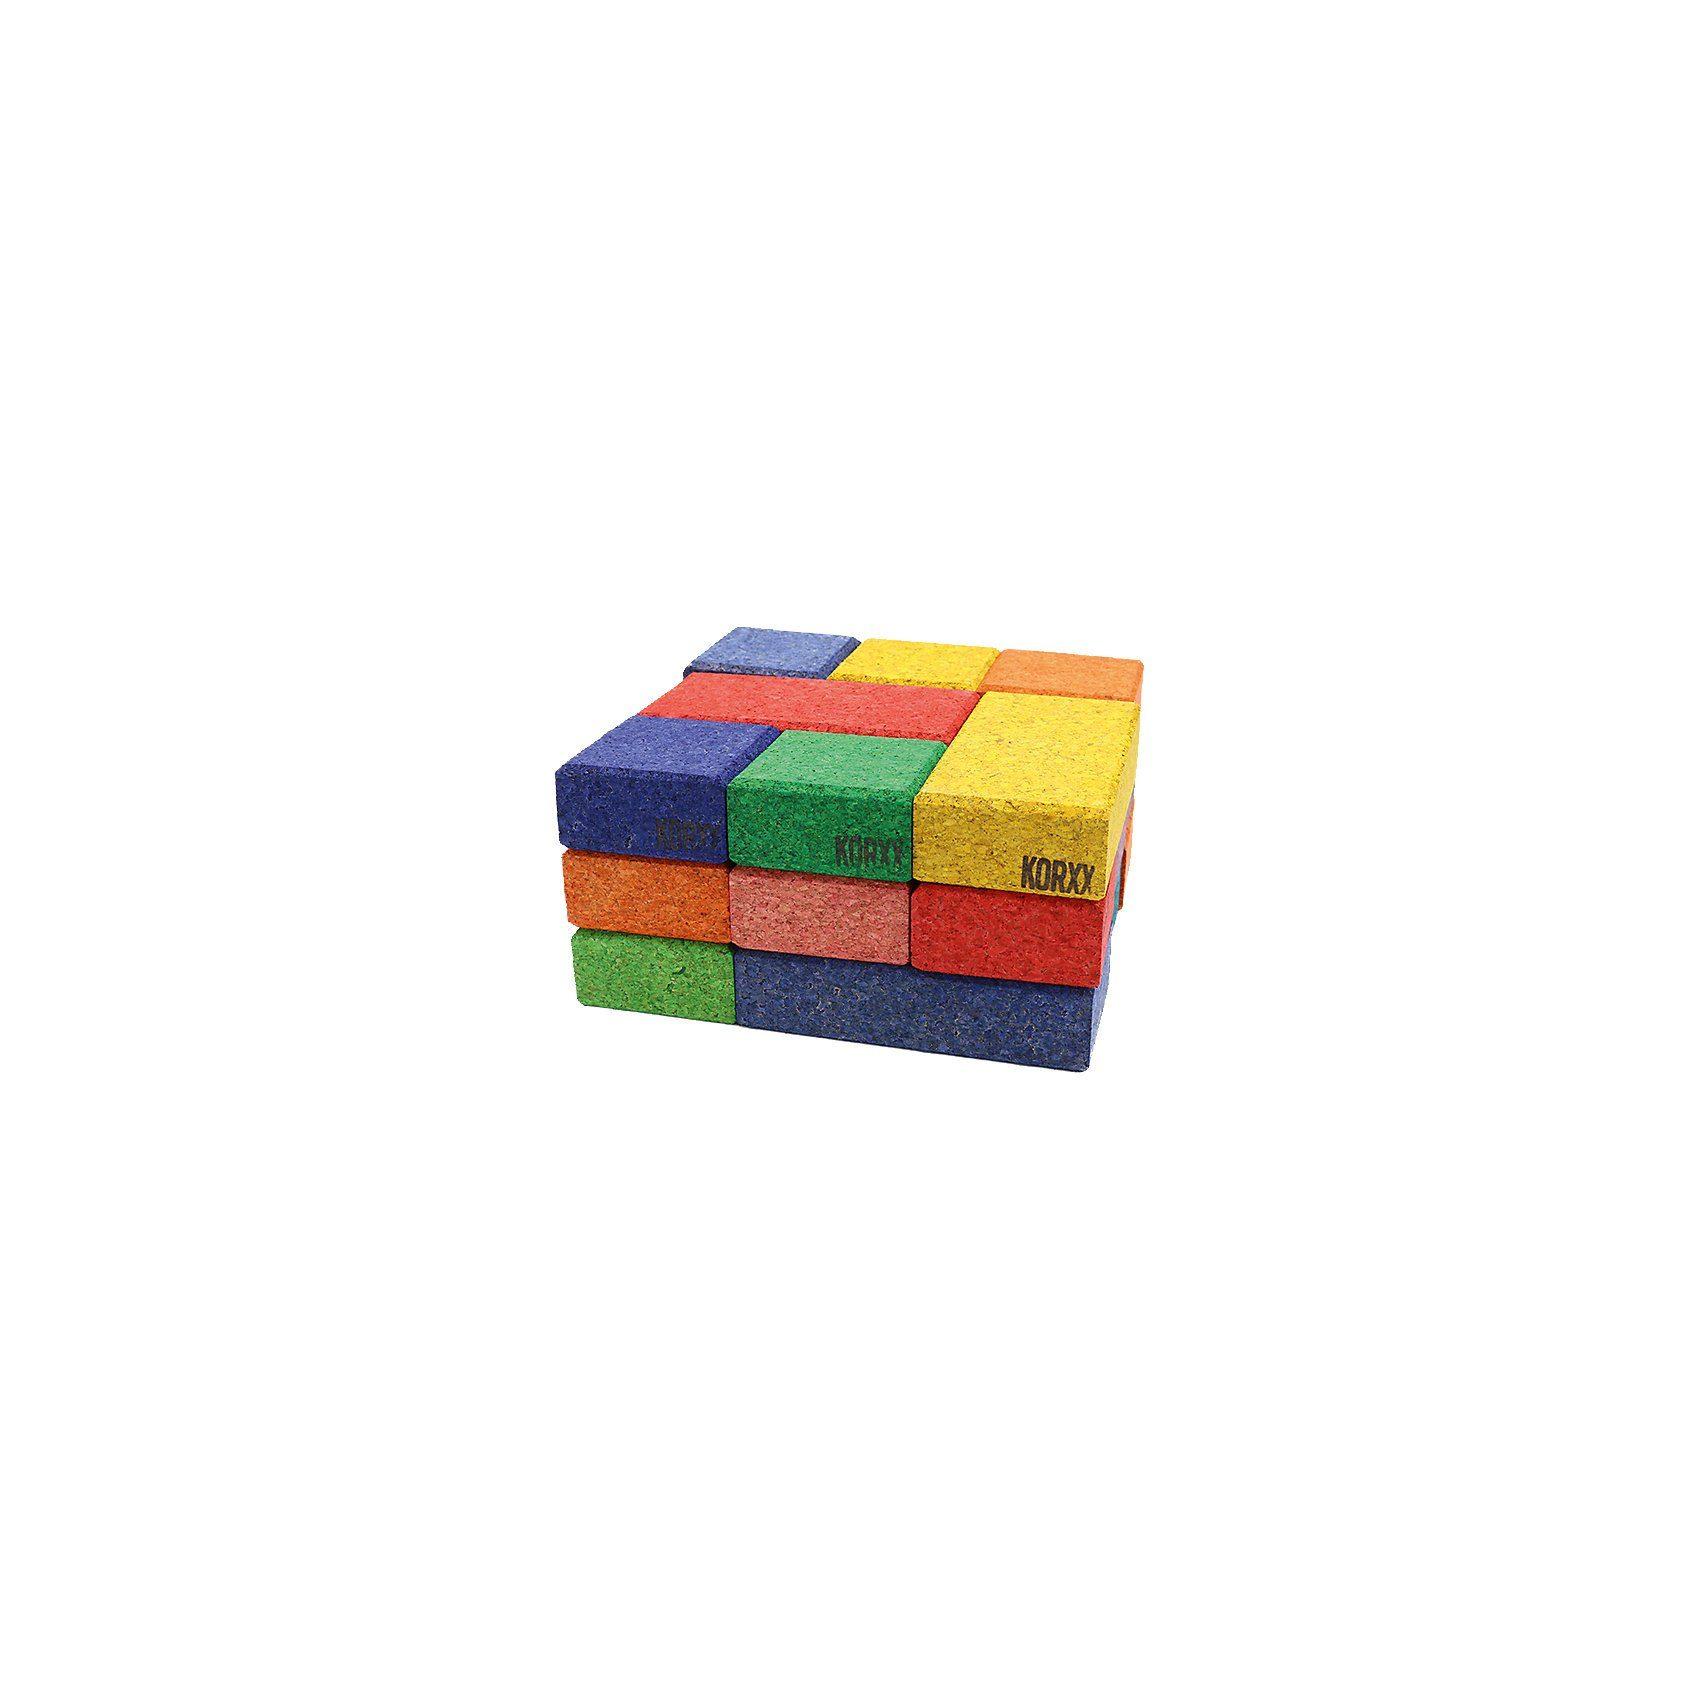 Korkbausteine Cuboid Mix Color, 19 Stk.